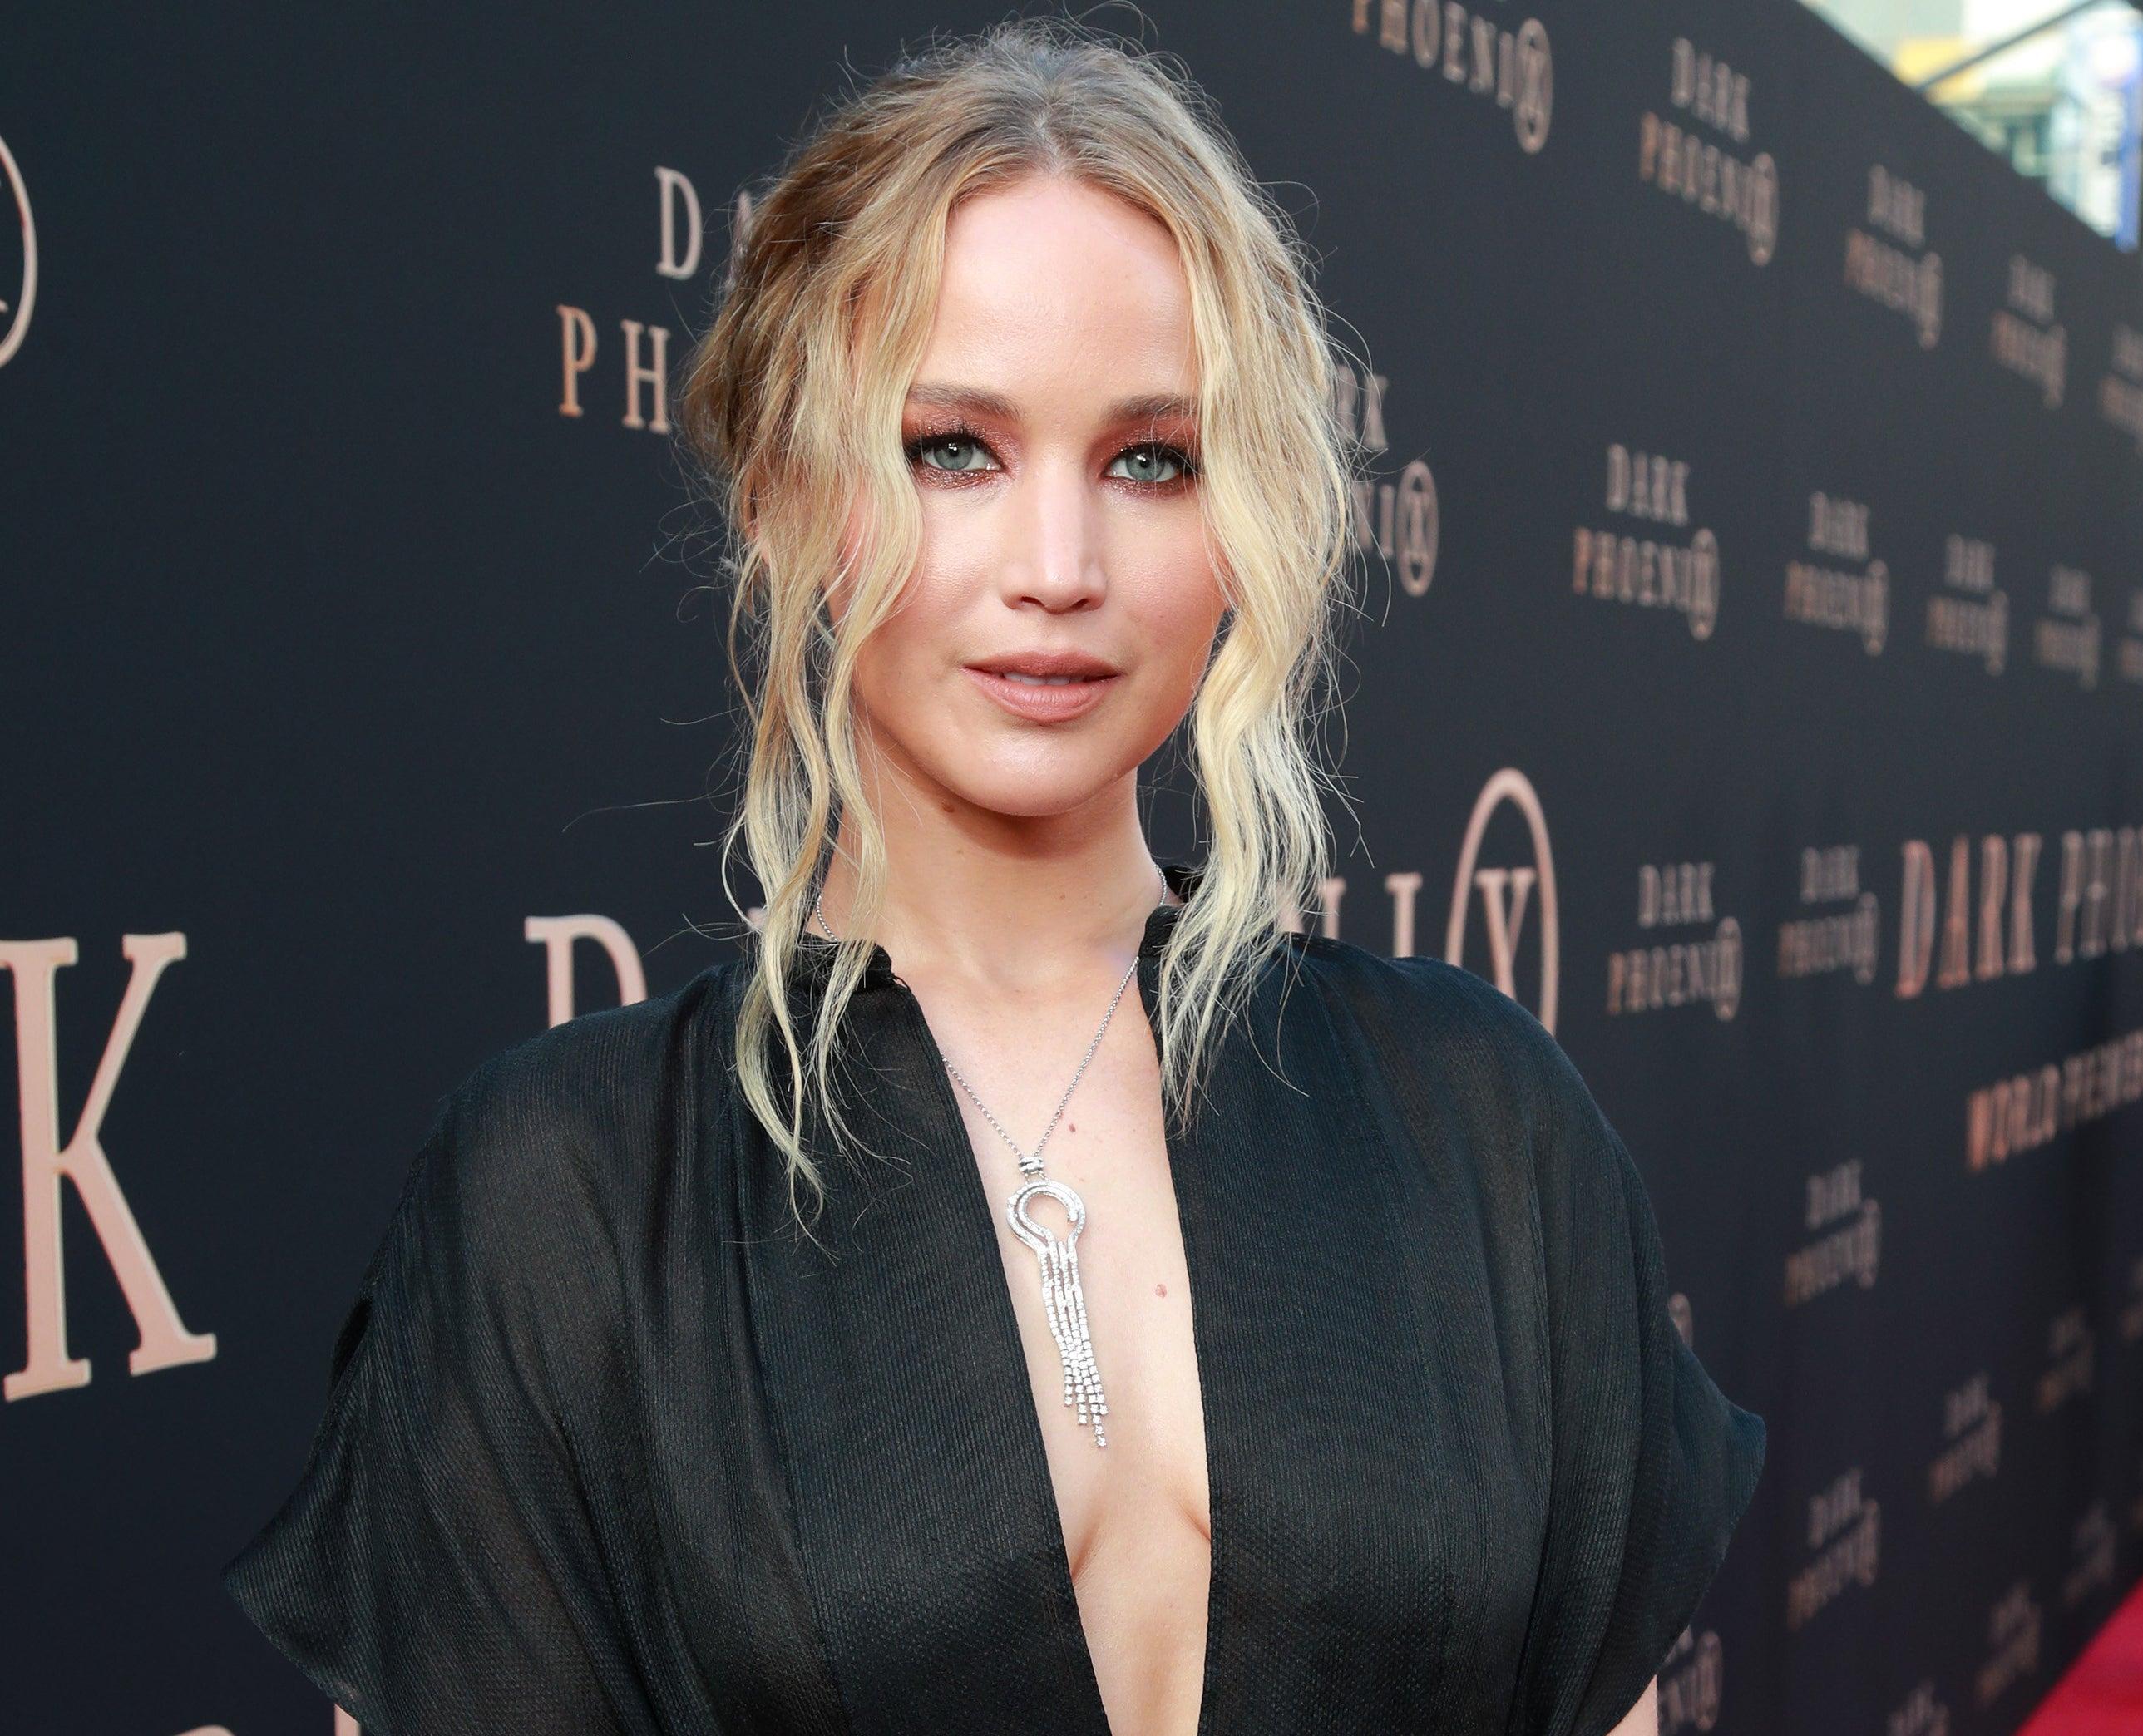 Jennifer wears a black dress with a plunging neckline